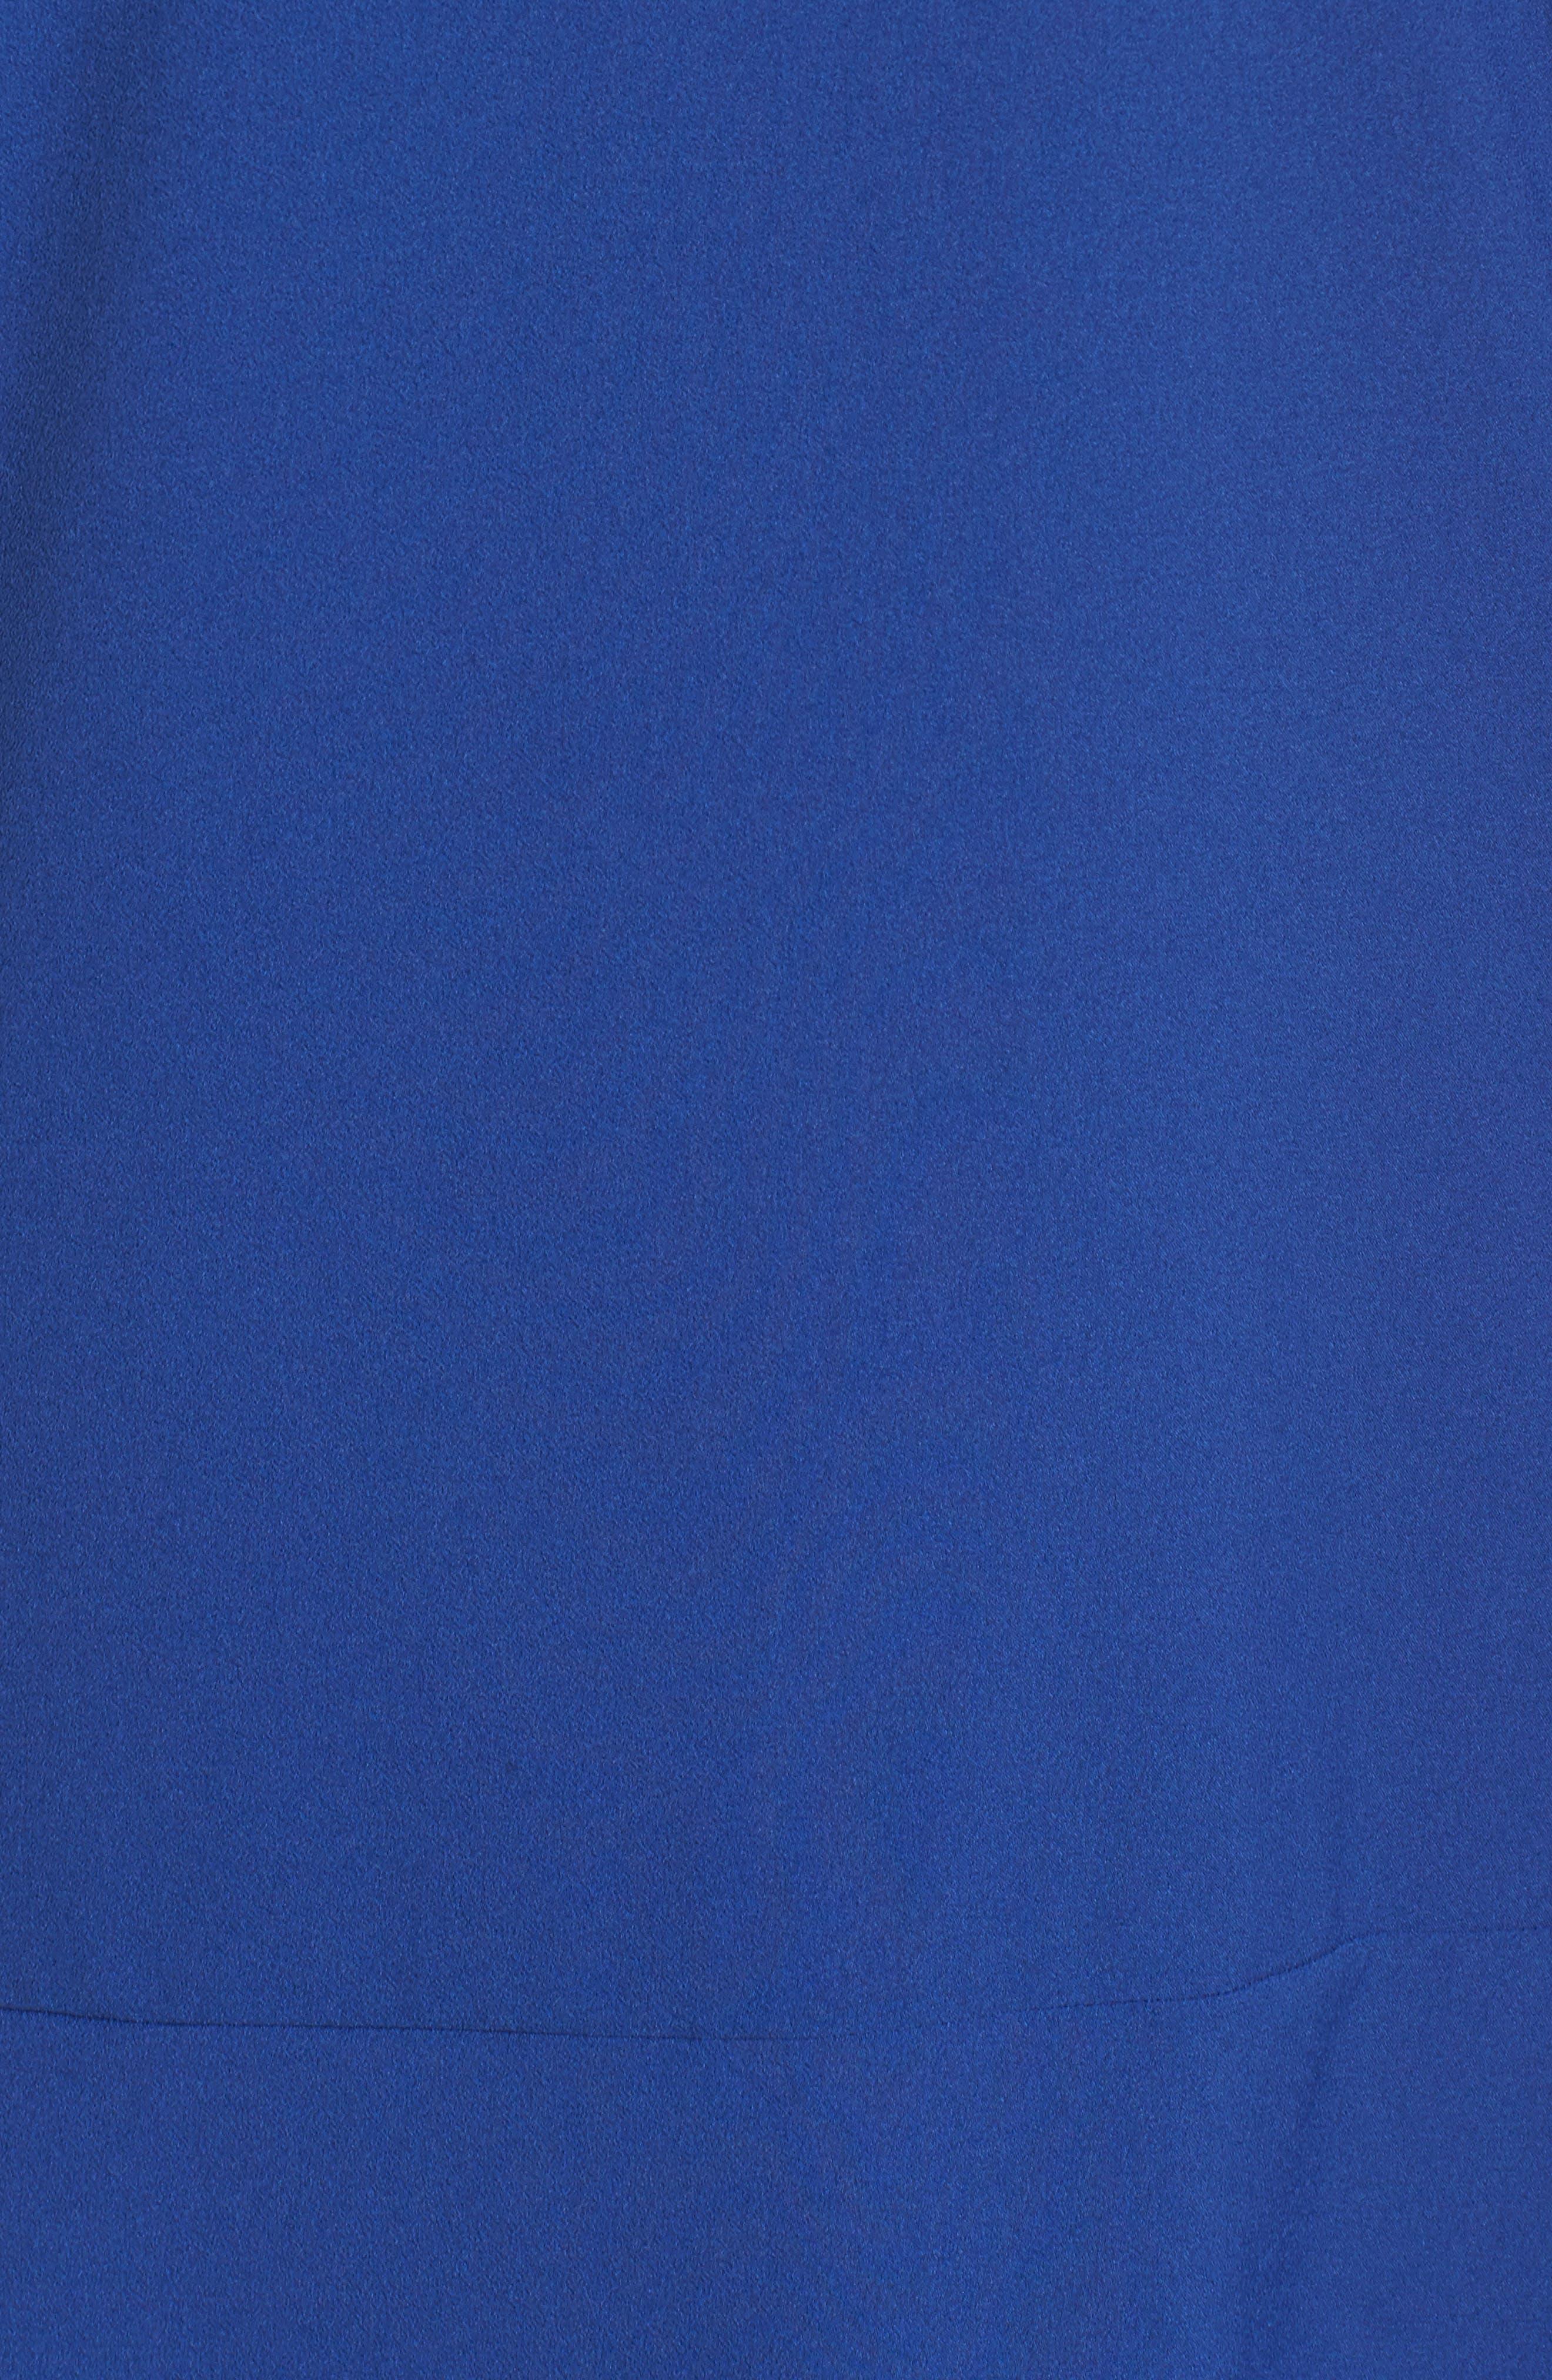 Long Sleeve Shift Dress,                             Alternate thumbnail 5, color,                             Cobalt